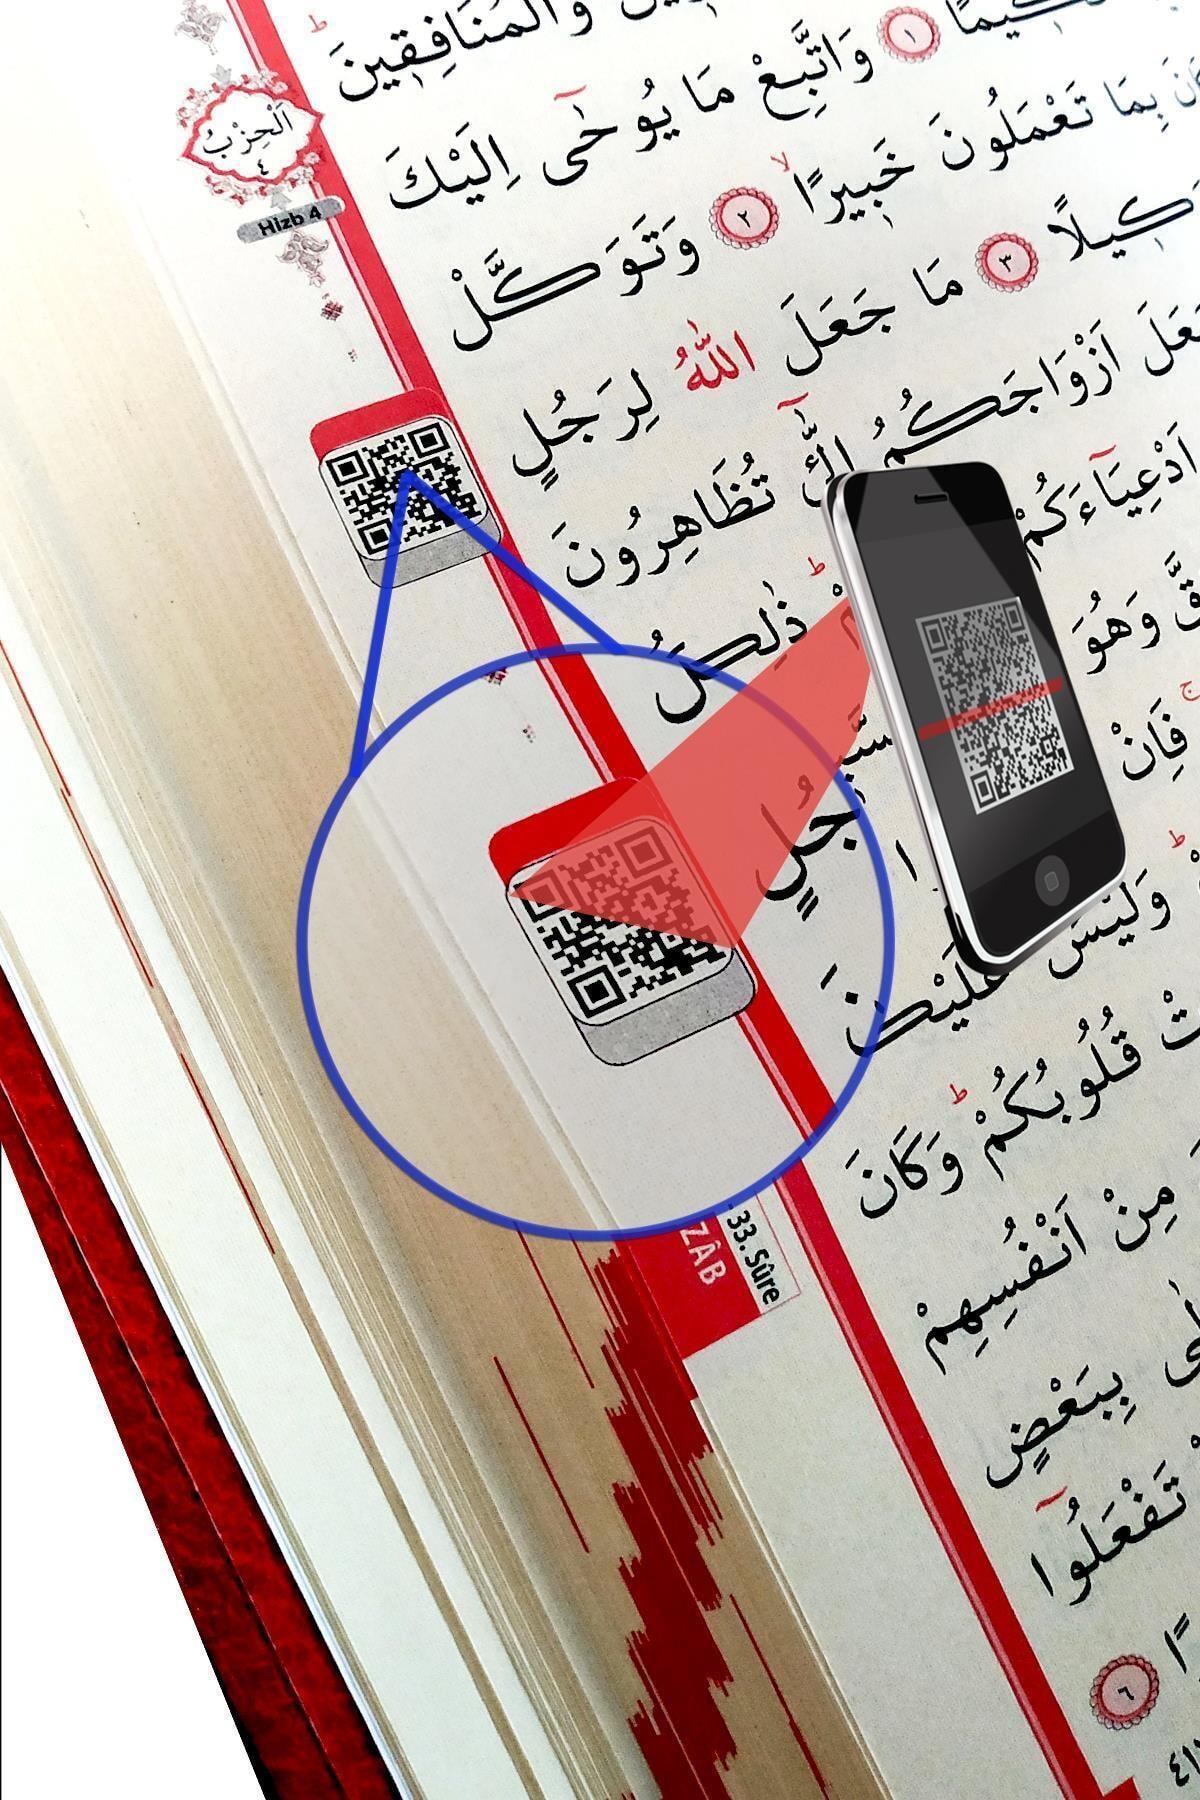 The Holy Quran Kaaba Pattern Muslim gift Islamic Amin Eid Mubarak  16.5x13 cm Computer Written Kuran Kerim